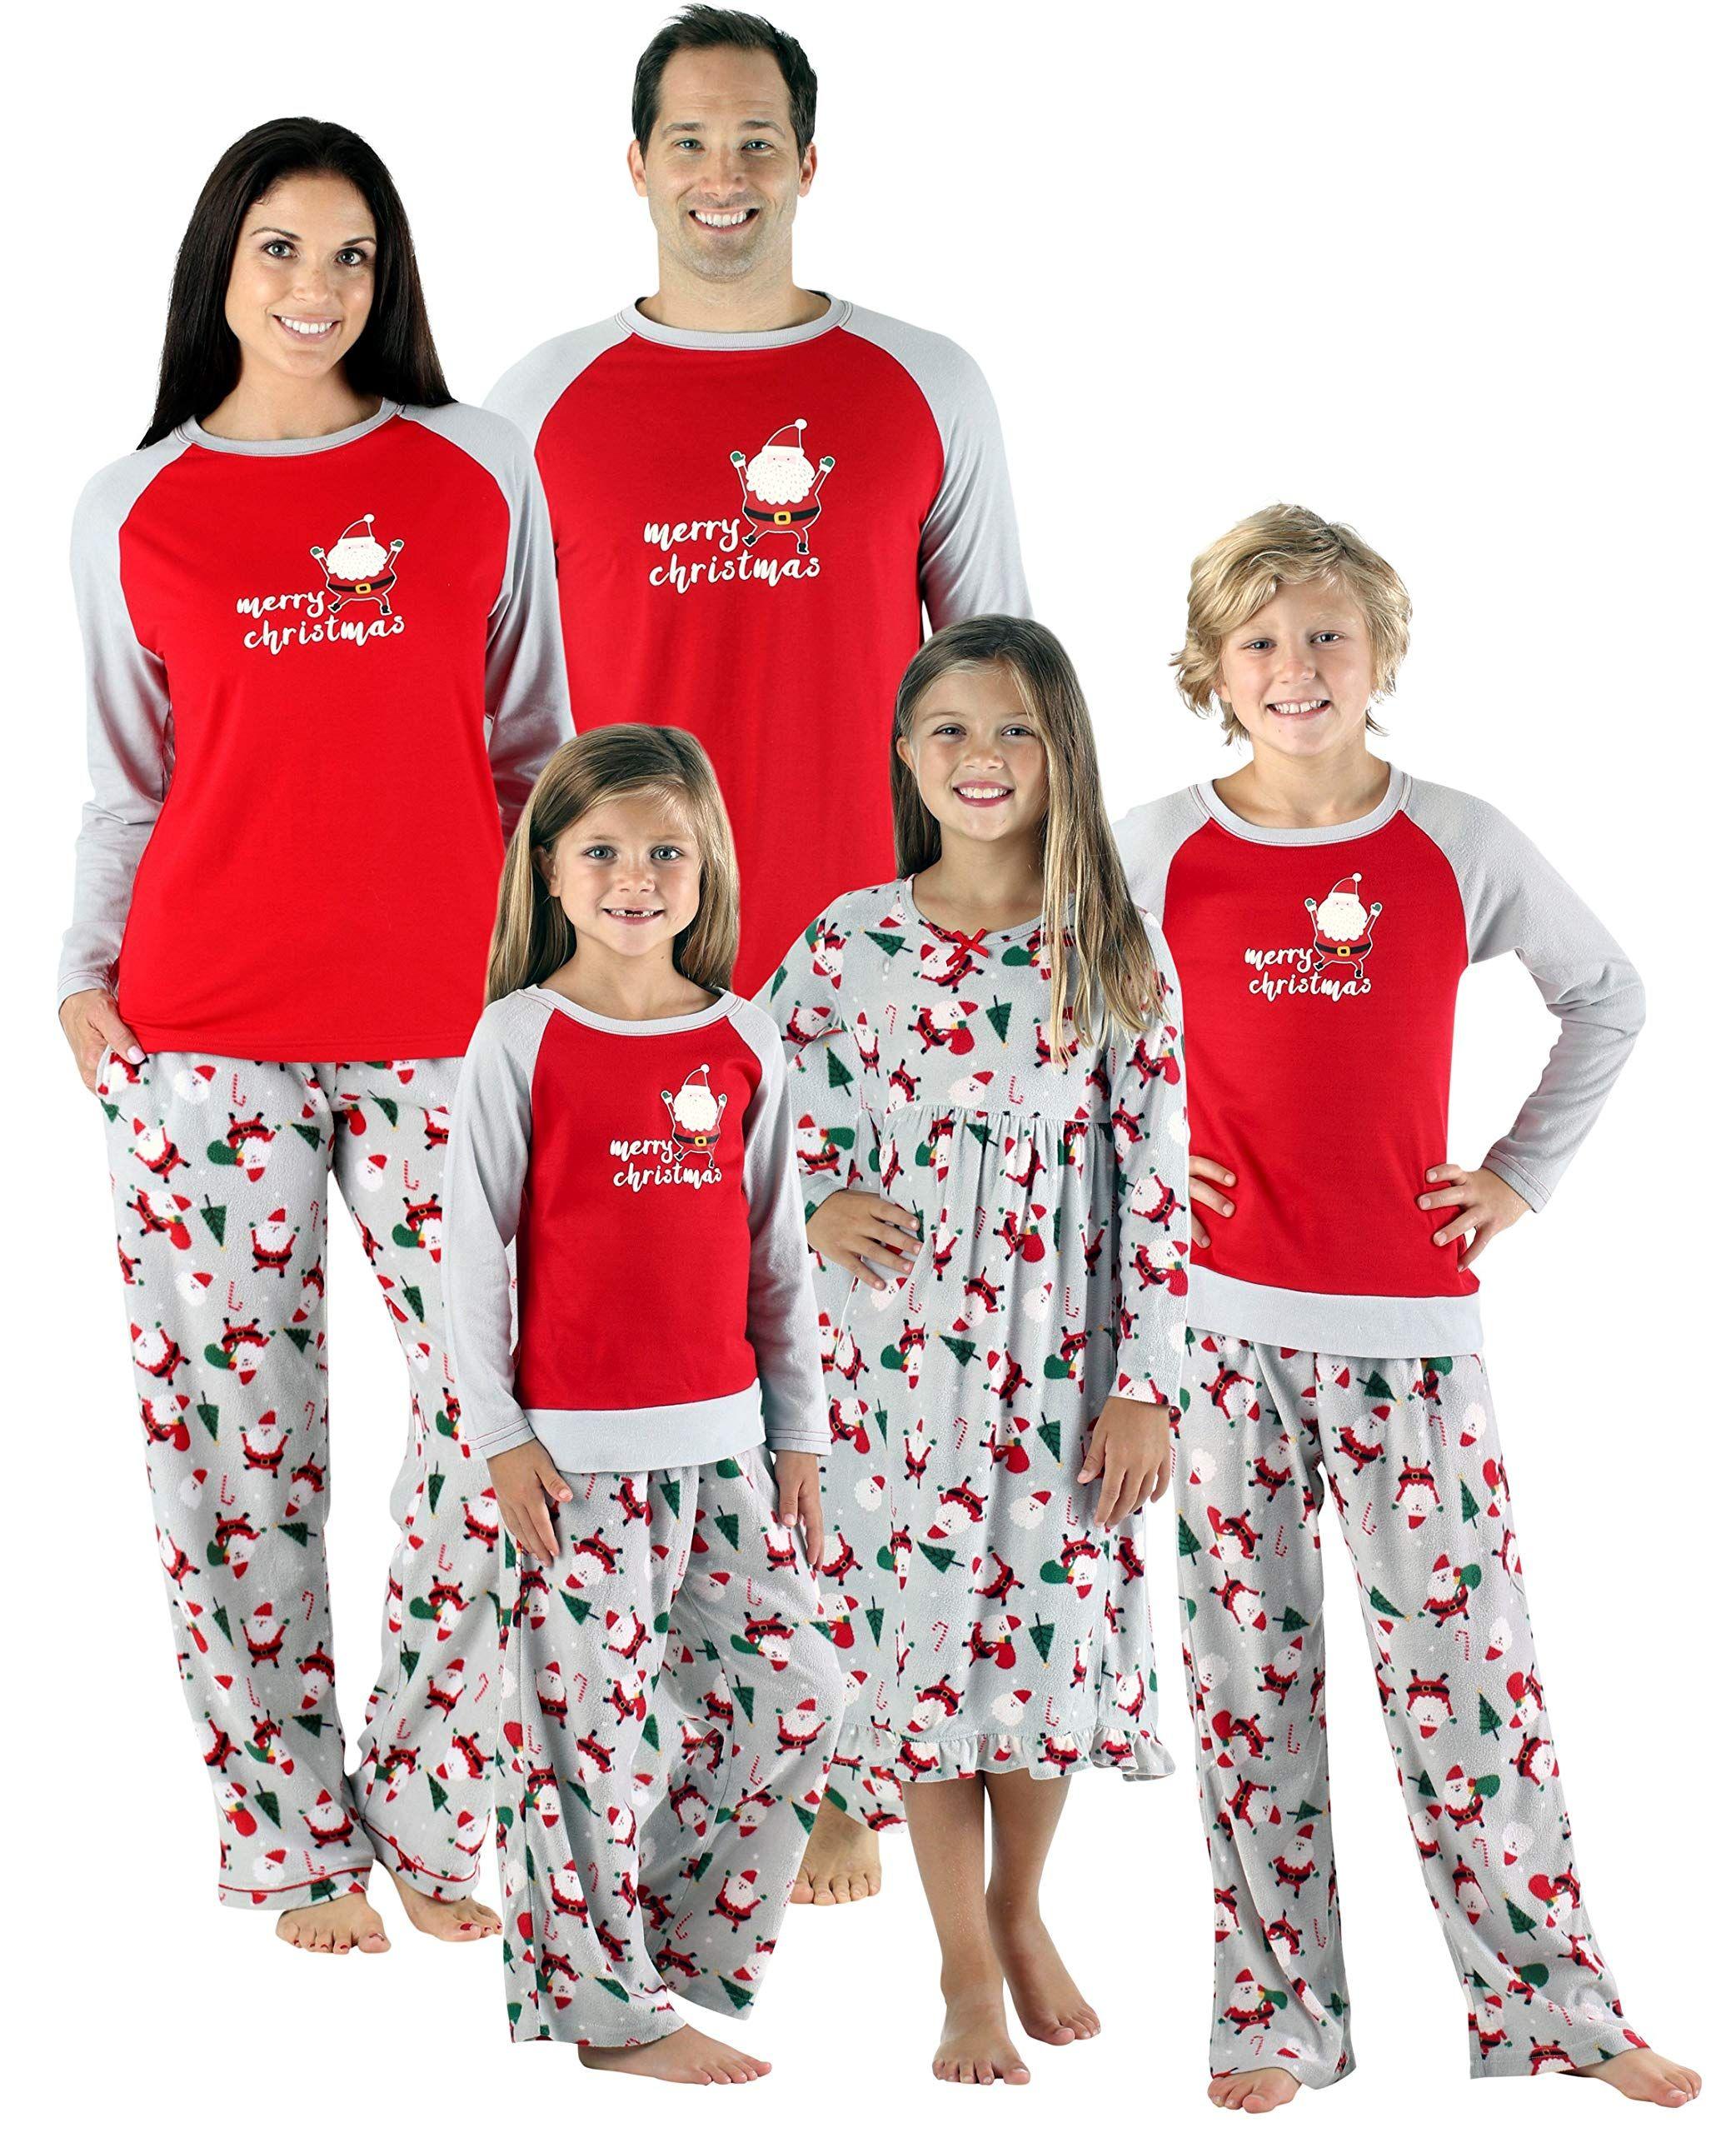 e95f0643da SleepytimePjs Christmas Family Matching Fleece Santa Pajama PJ SetsKids  Nightgown STMF4036G2T *** More info could be found at the image url.